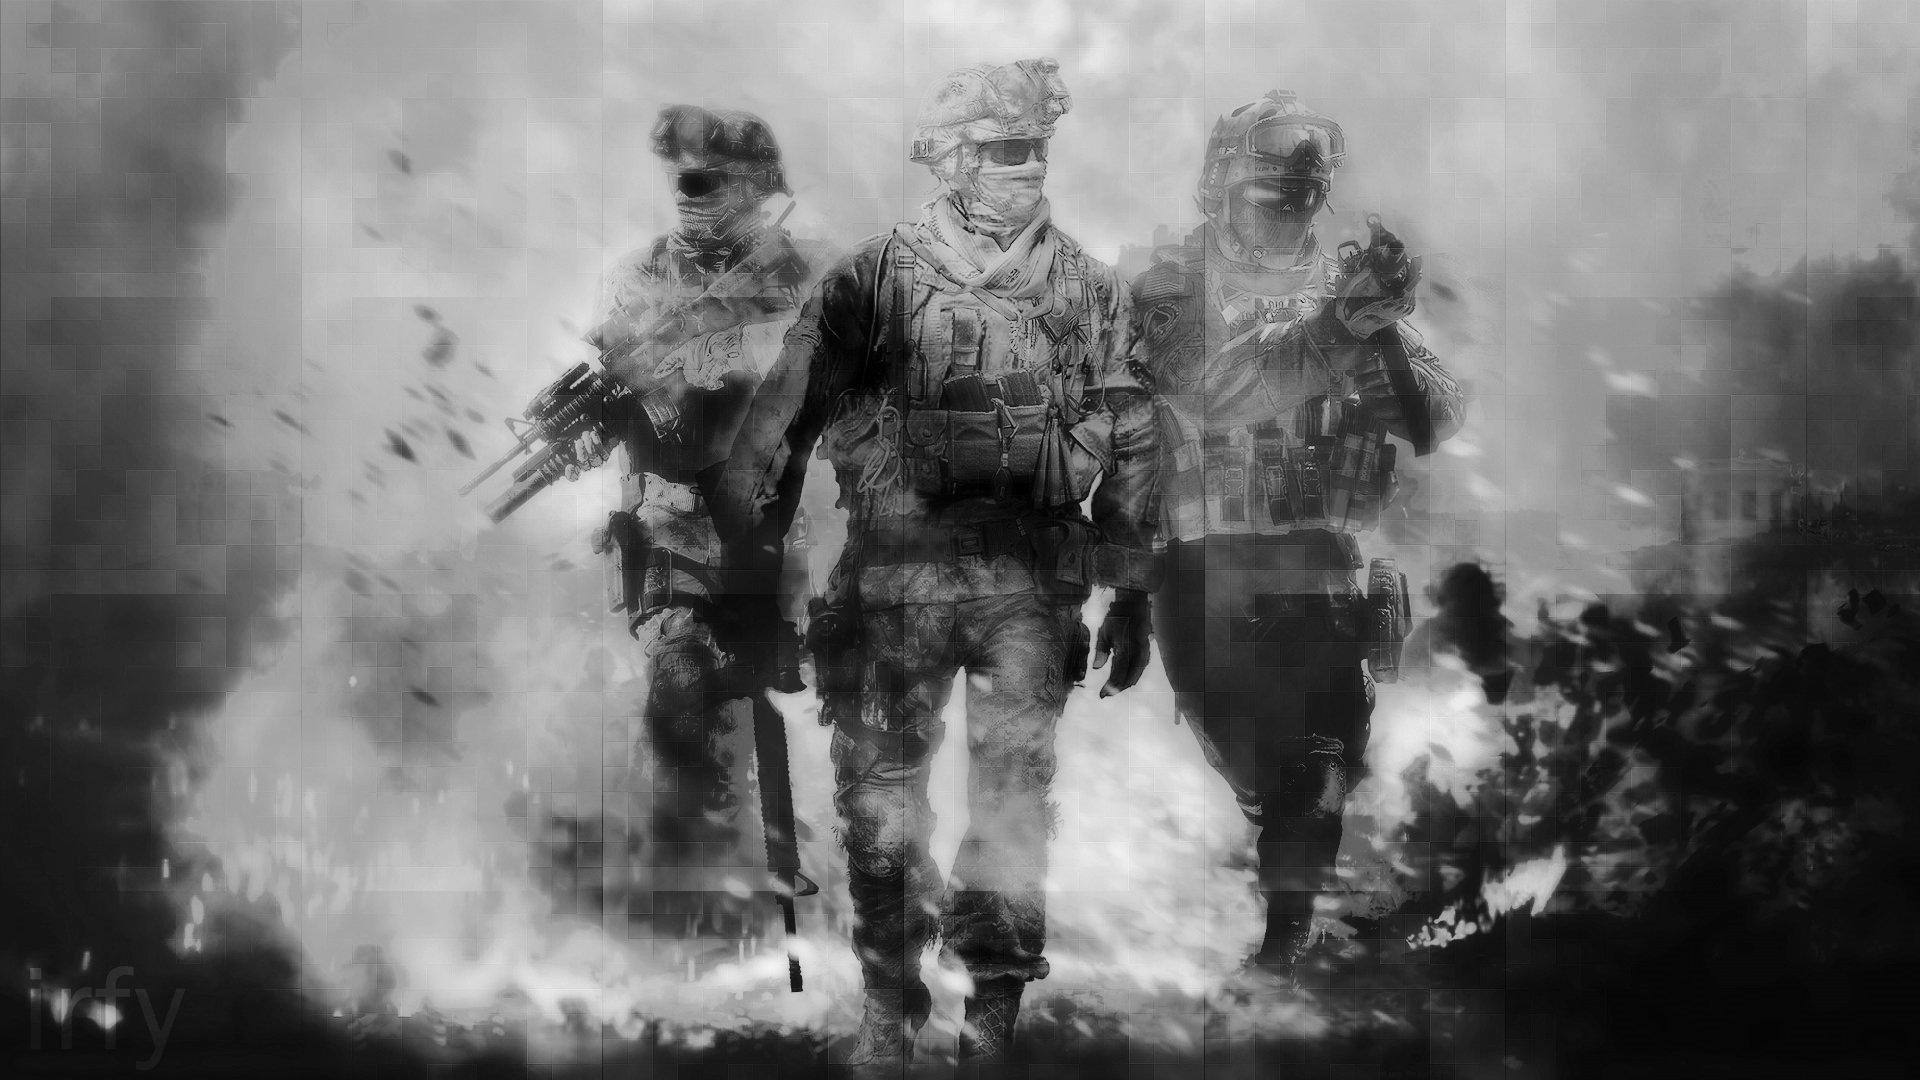 Call Of Duty Modern Warfare 2 MW2 wallpapers 1920x1080